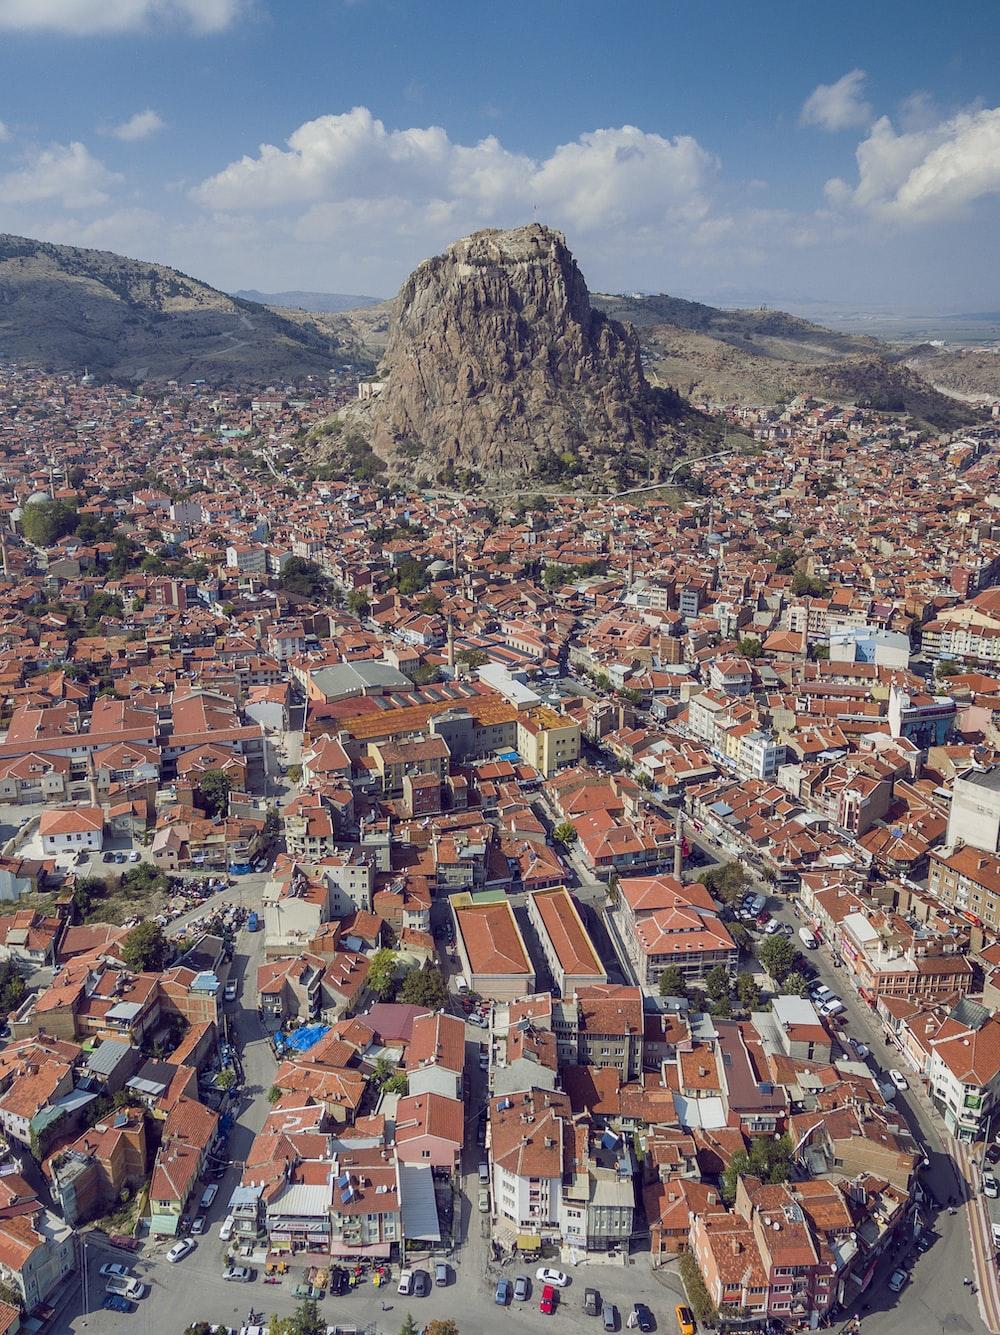 bird's-eye-view photography of city